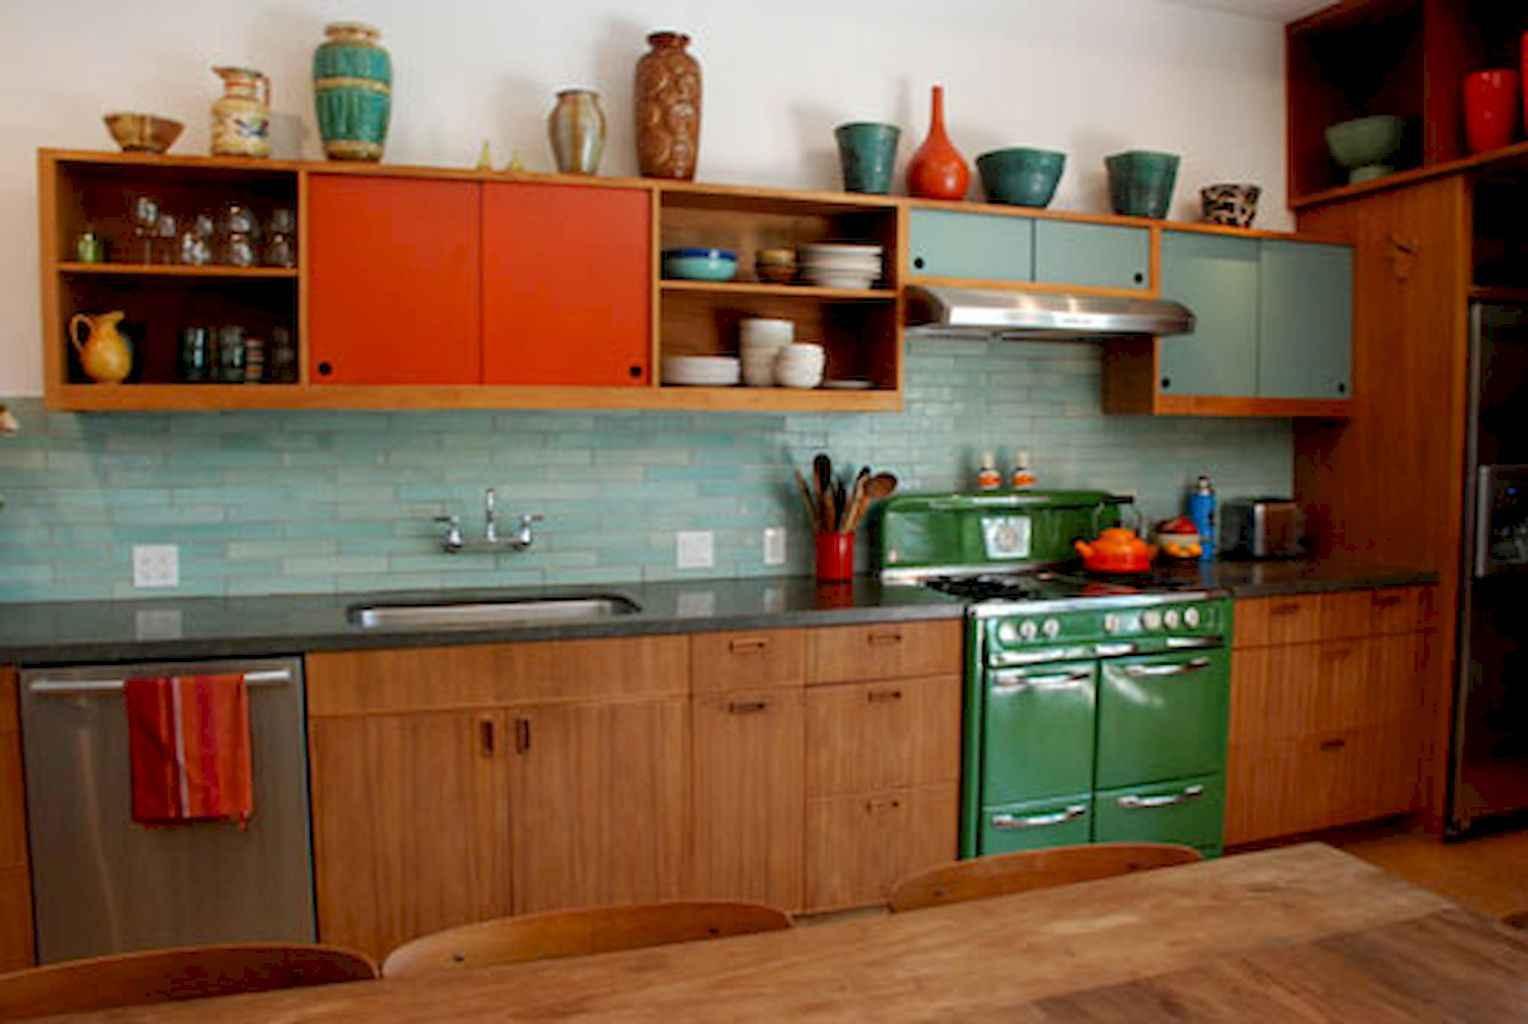 Mid century modern kitchen design ideas (1)